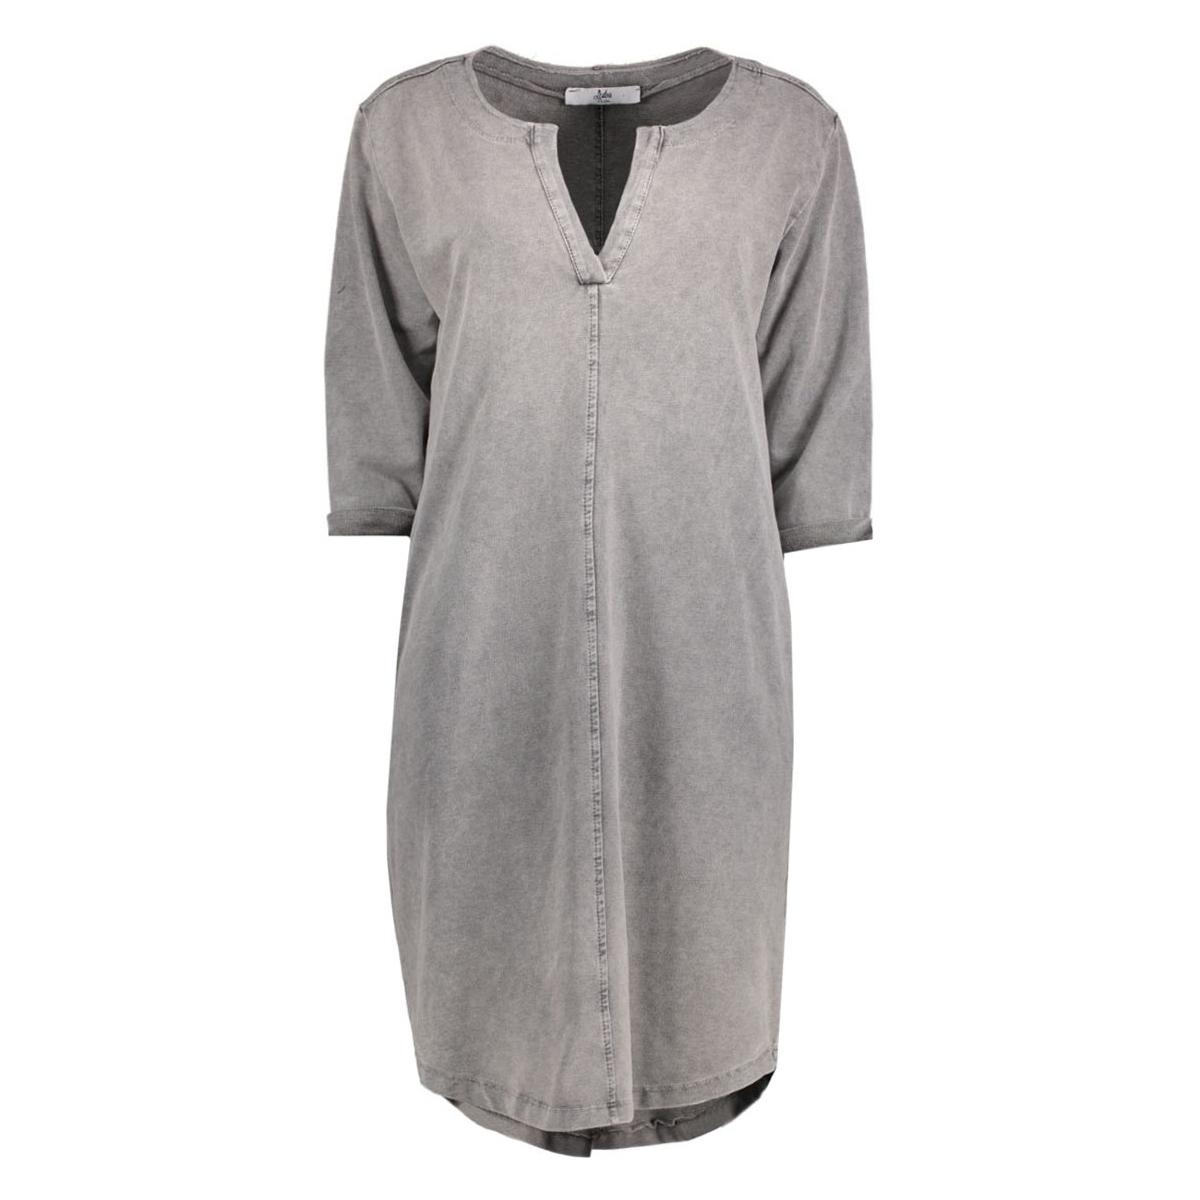 8135 dress v-neck luba jurk grey